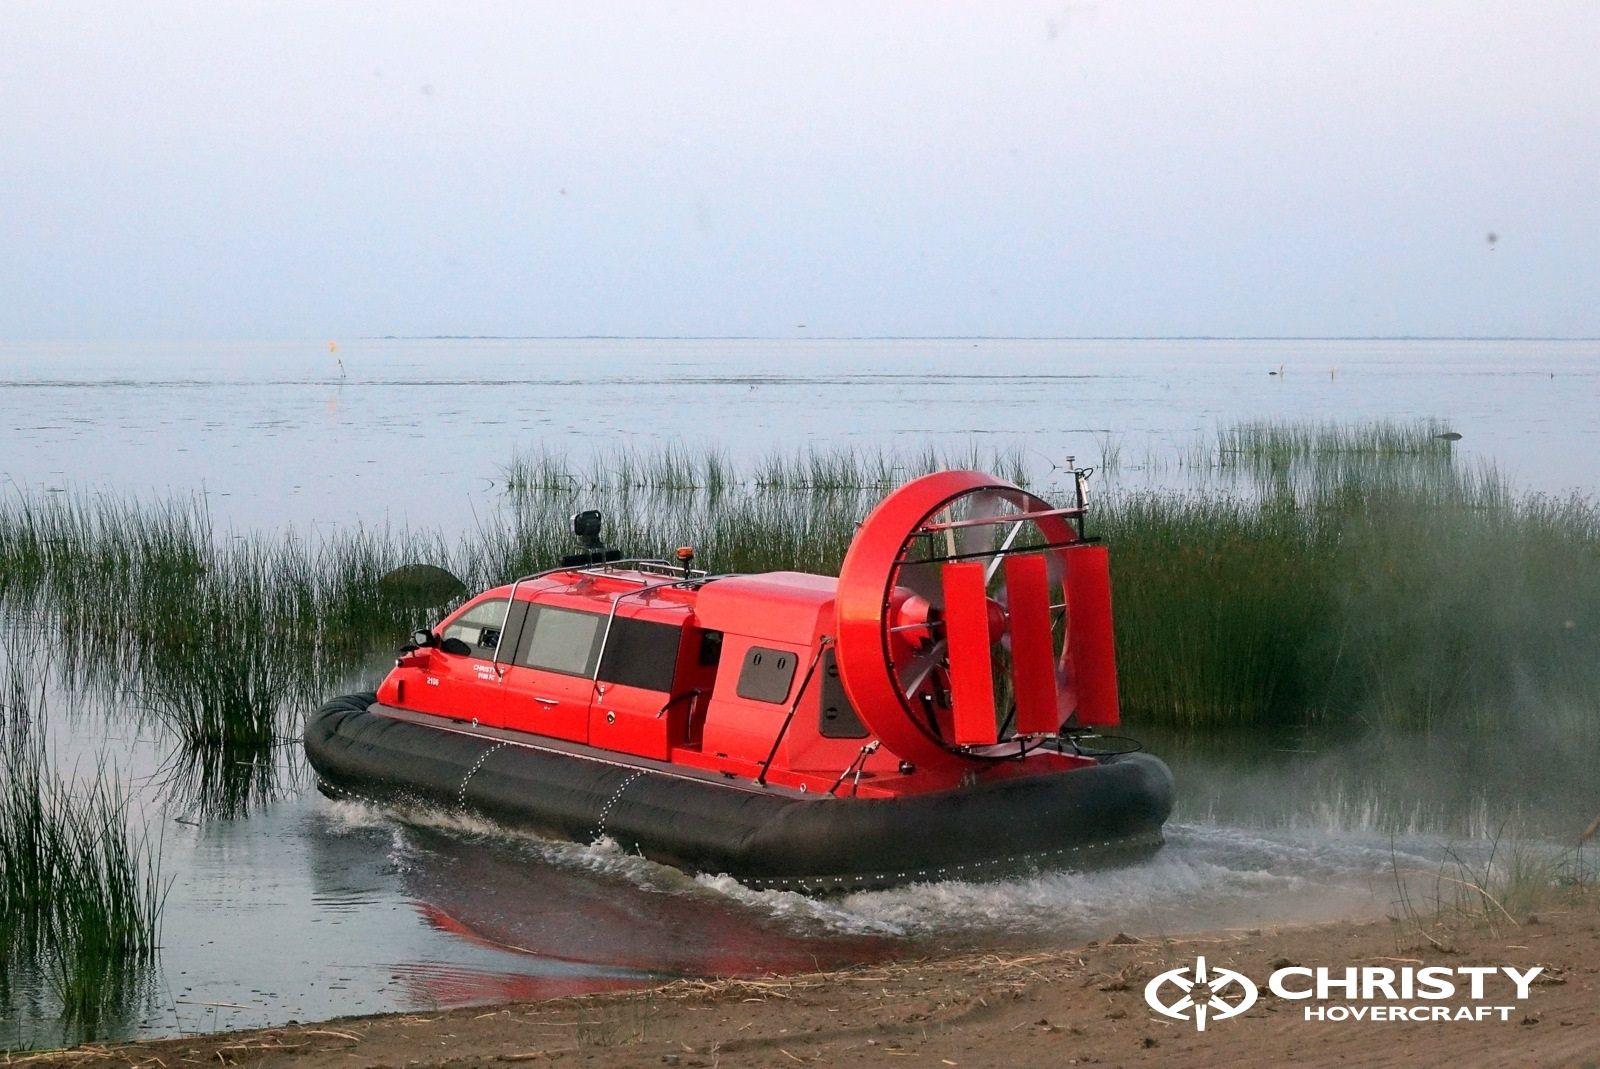 Тест-драйв катера-амфибии Christy 8186 FC Duct для правительства Канады   фото №2